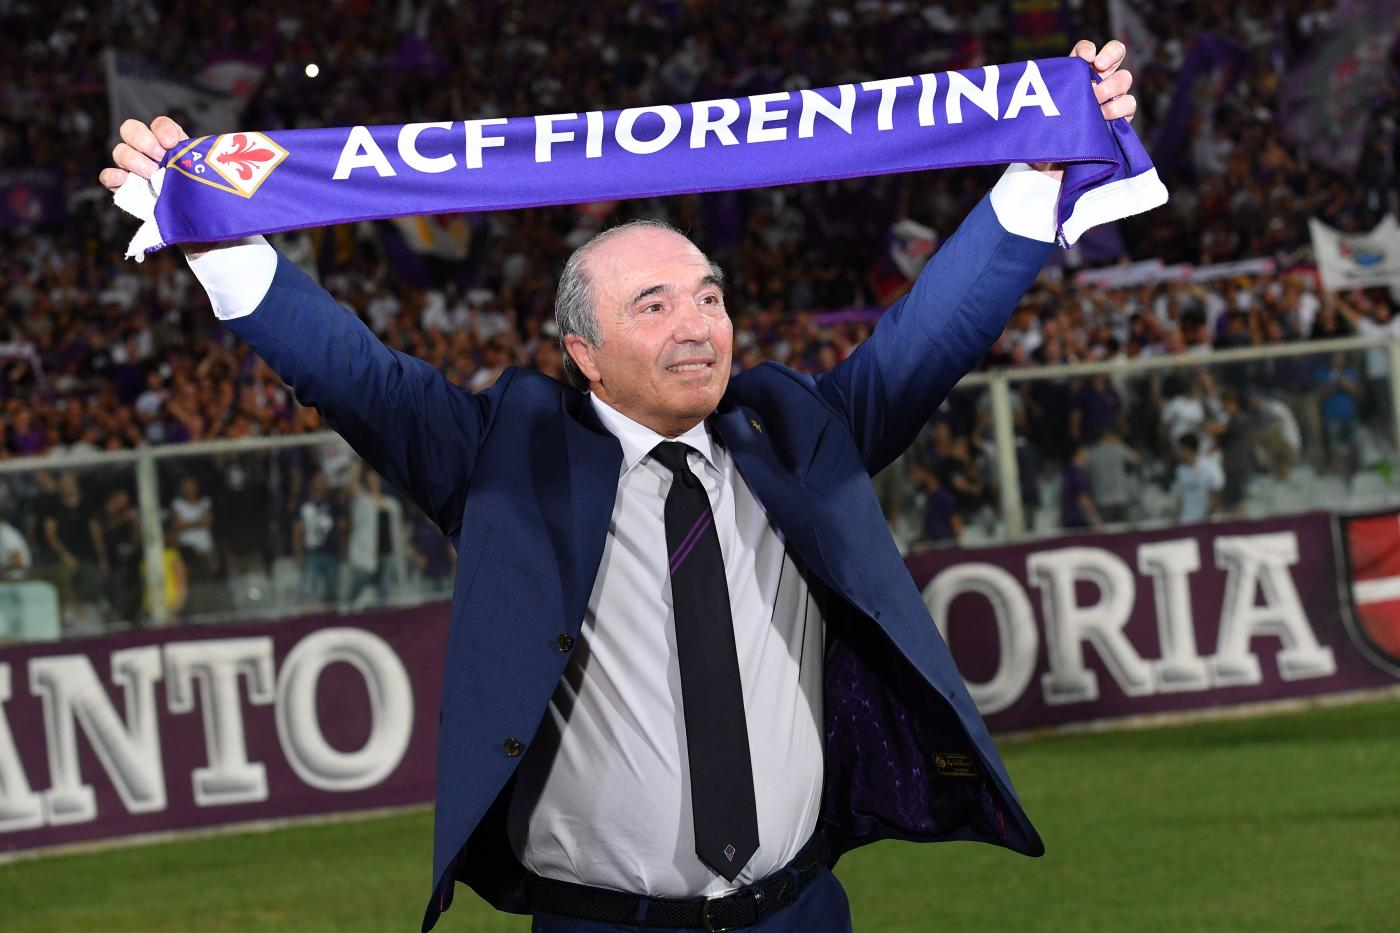 La Fiorentina si tinge d'azzurro, con un tris d'assi